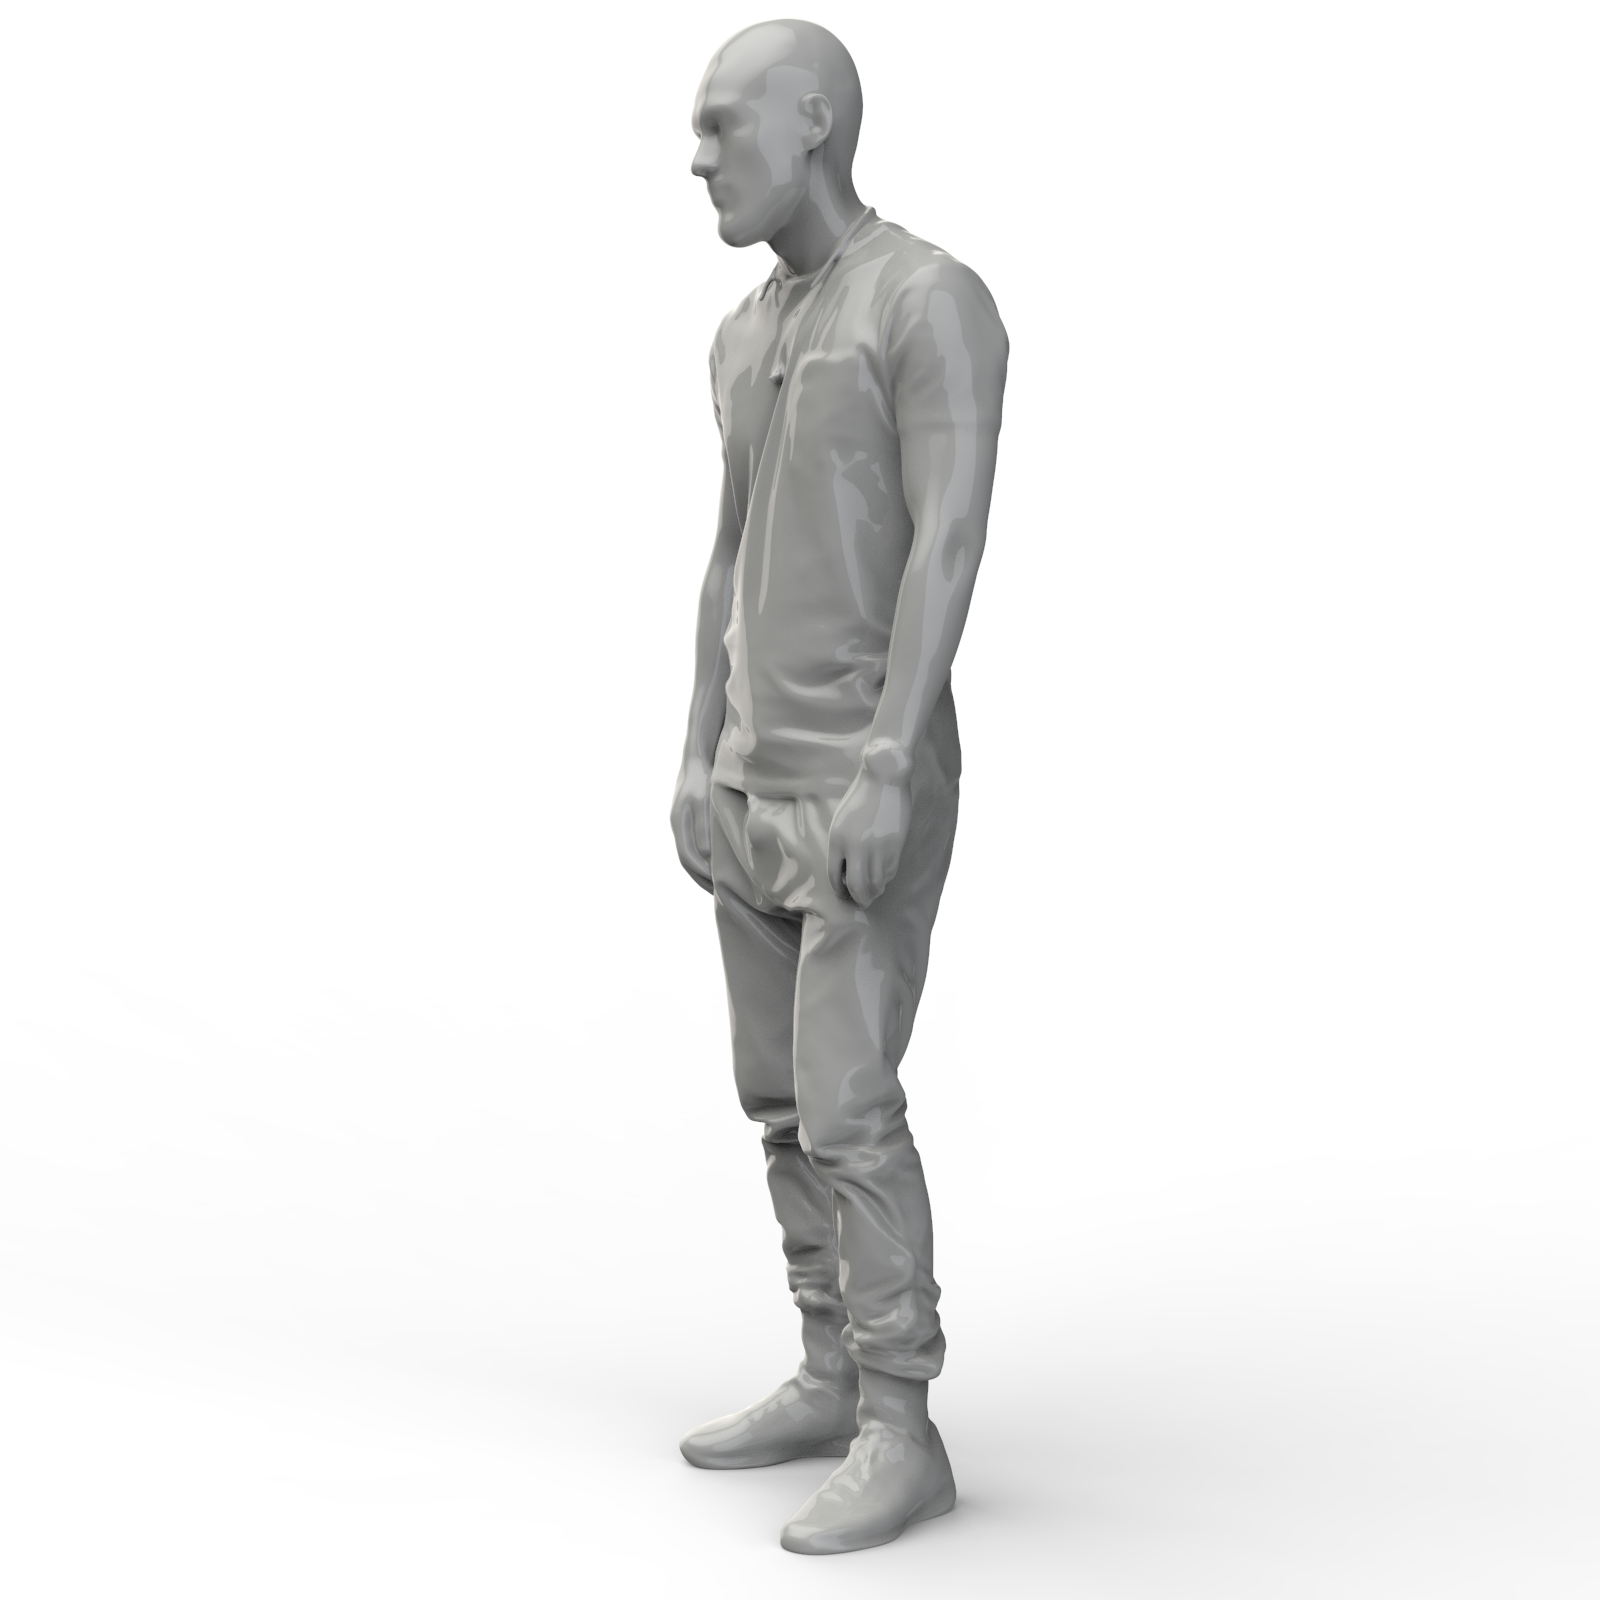 3D扫描男人模型【step】.rar